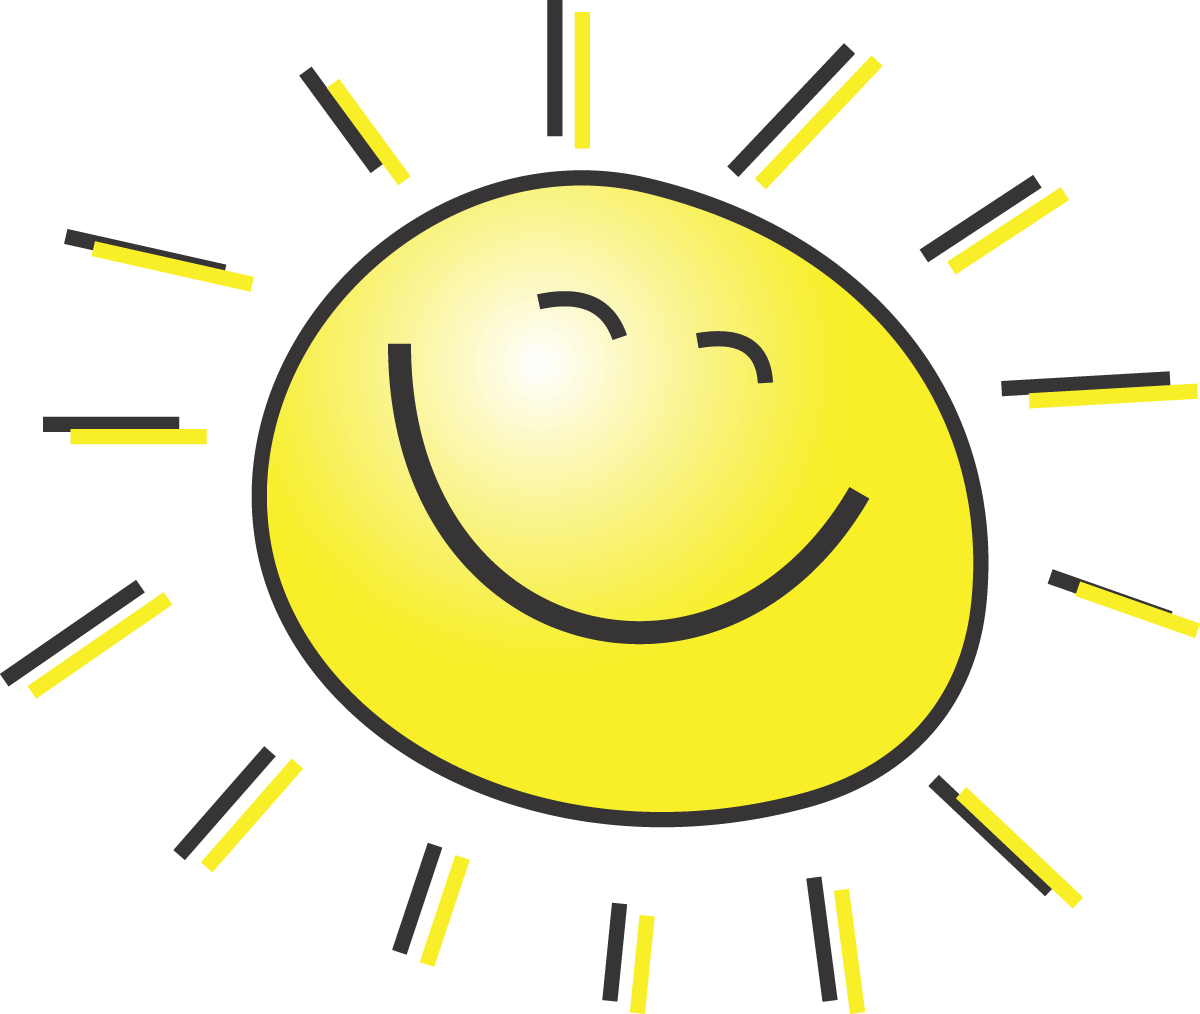 sun clipart png - Sun Clipart